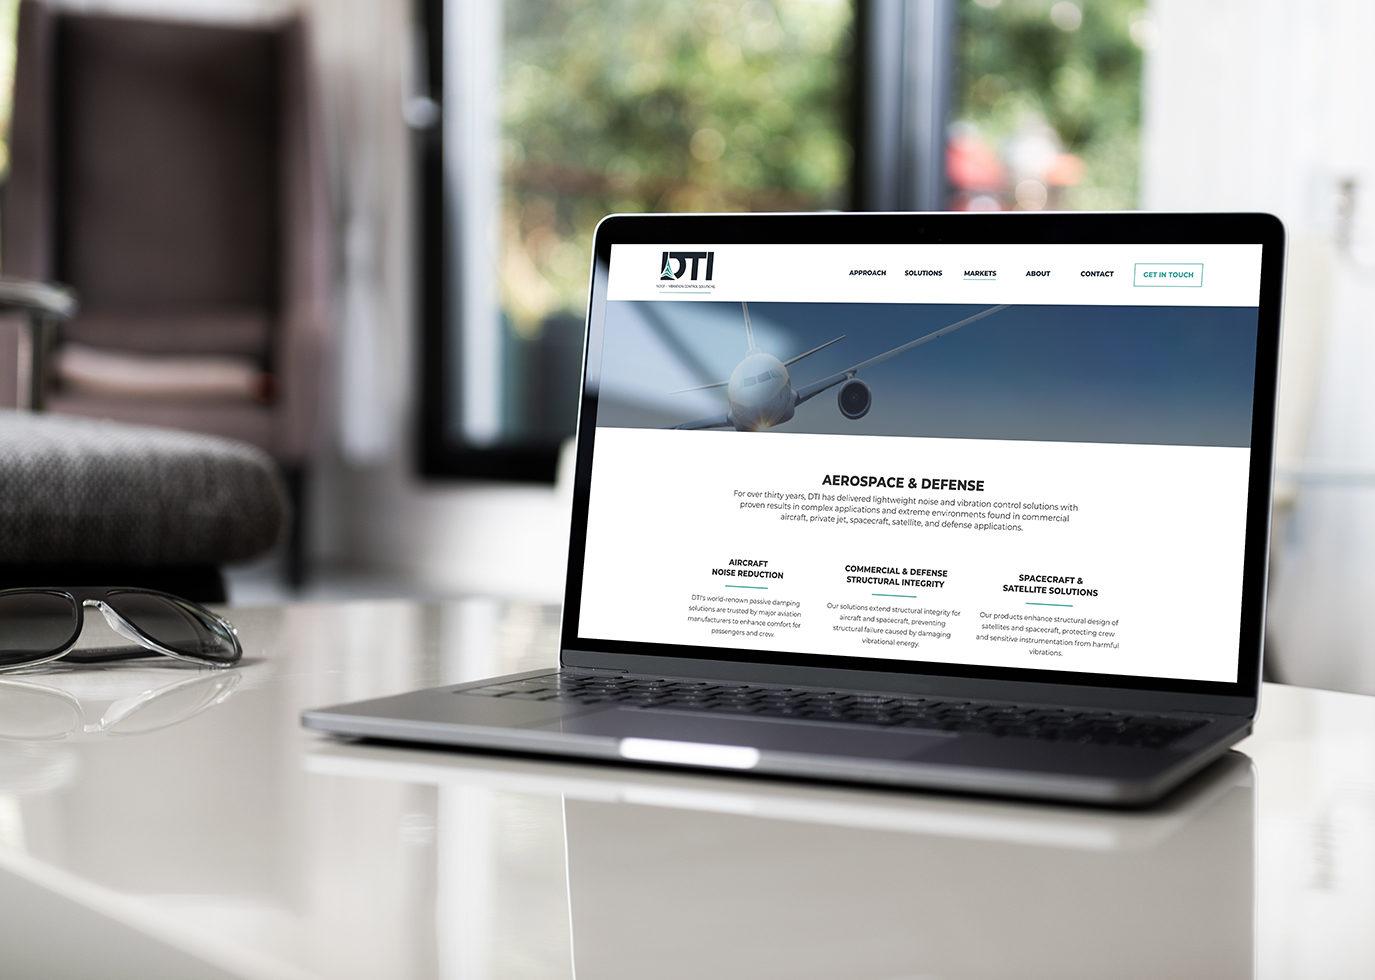 DTI on a laptop